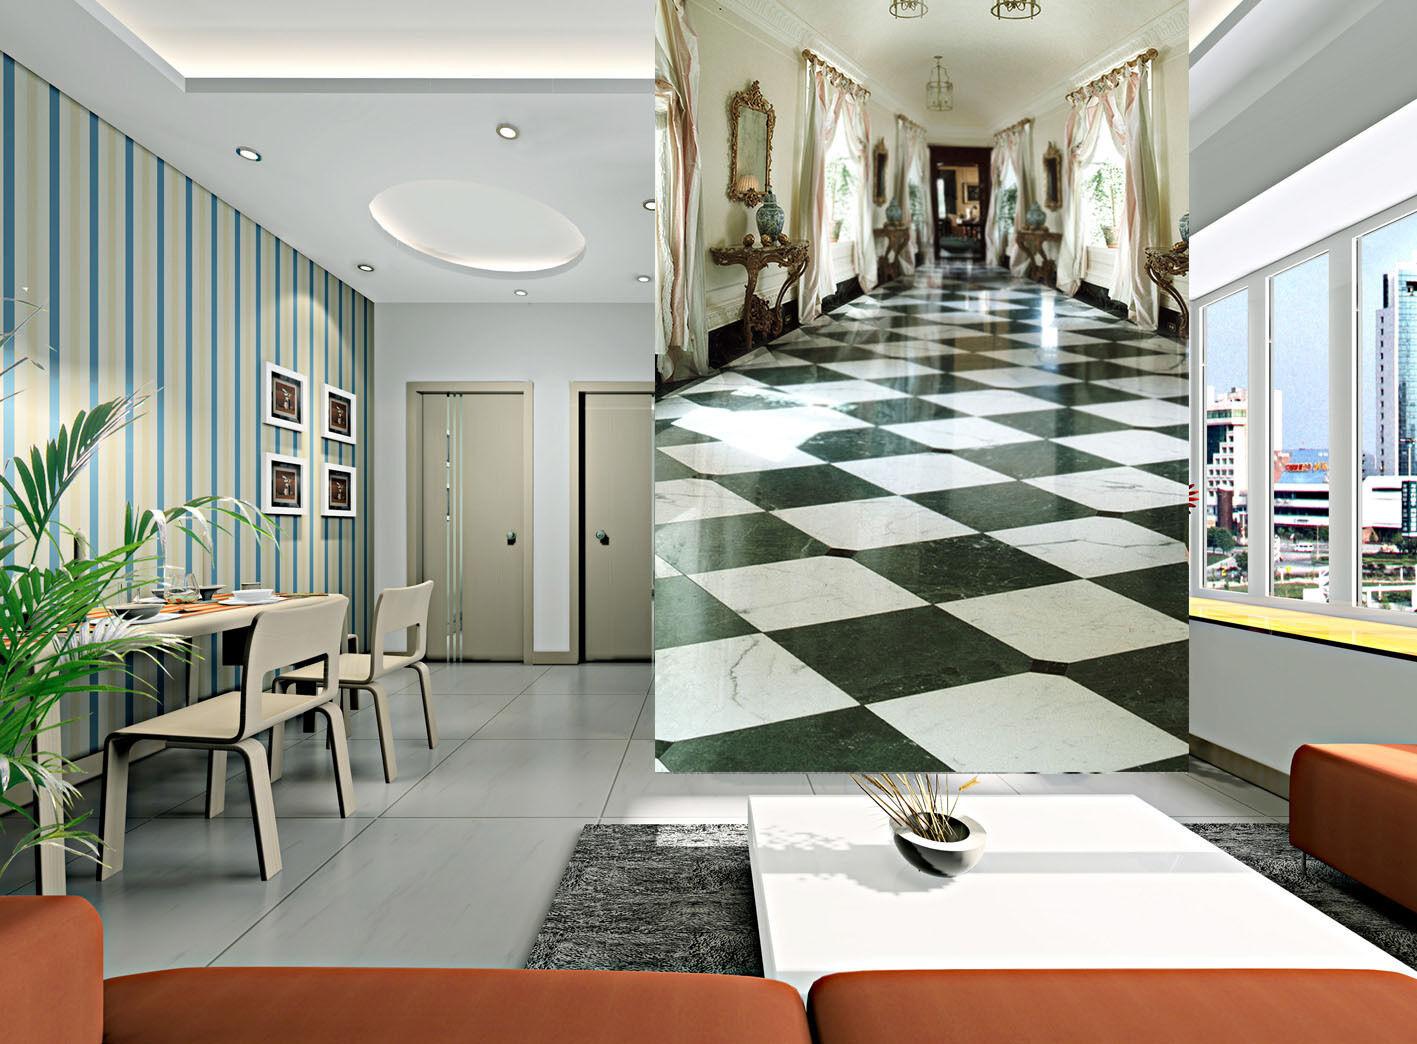 3D Pulito Sala 4 Parete Murale Foto Carta da parati immagine sfondo muro stampa